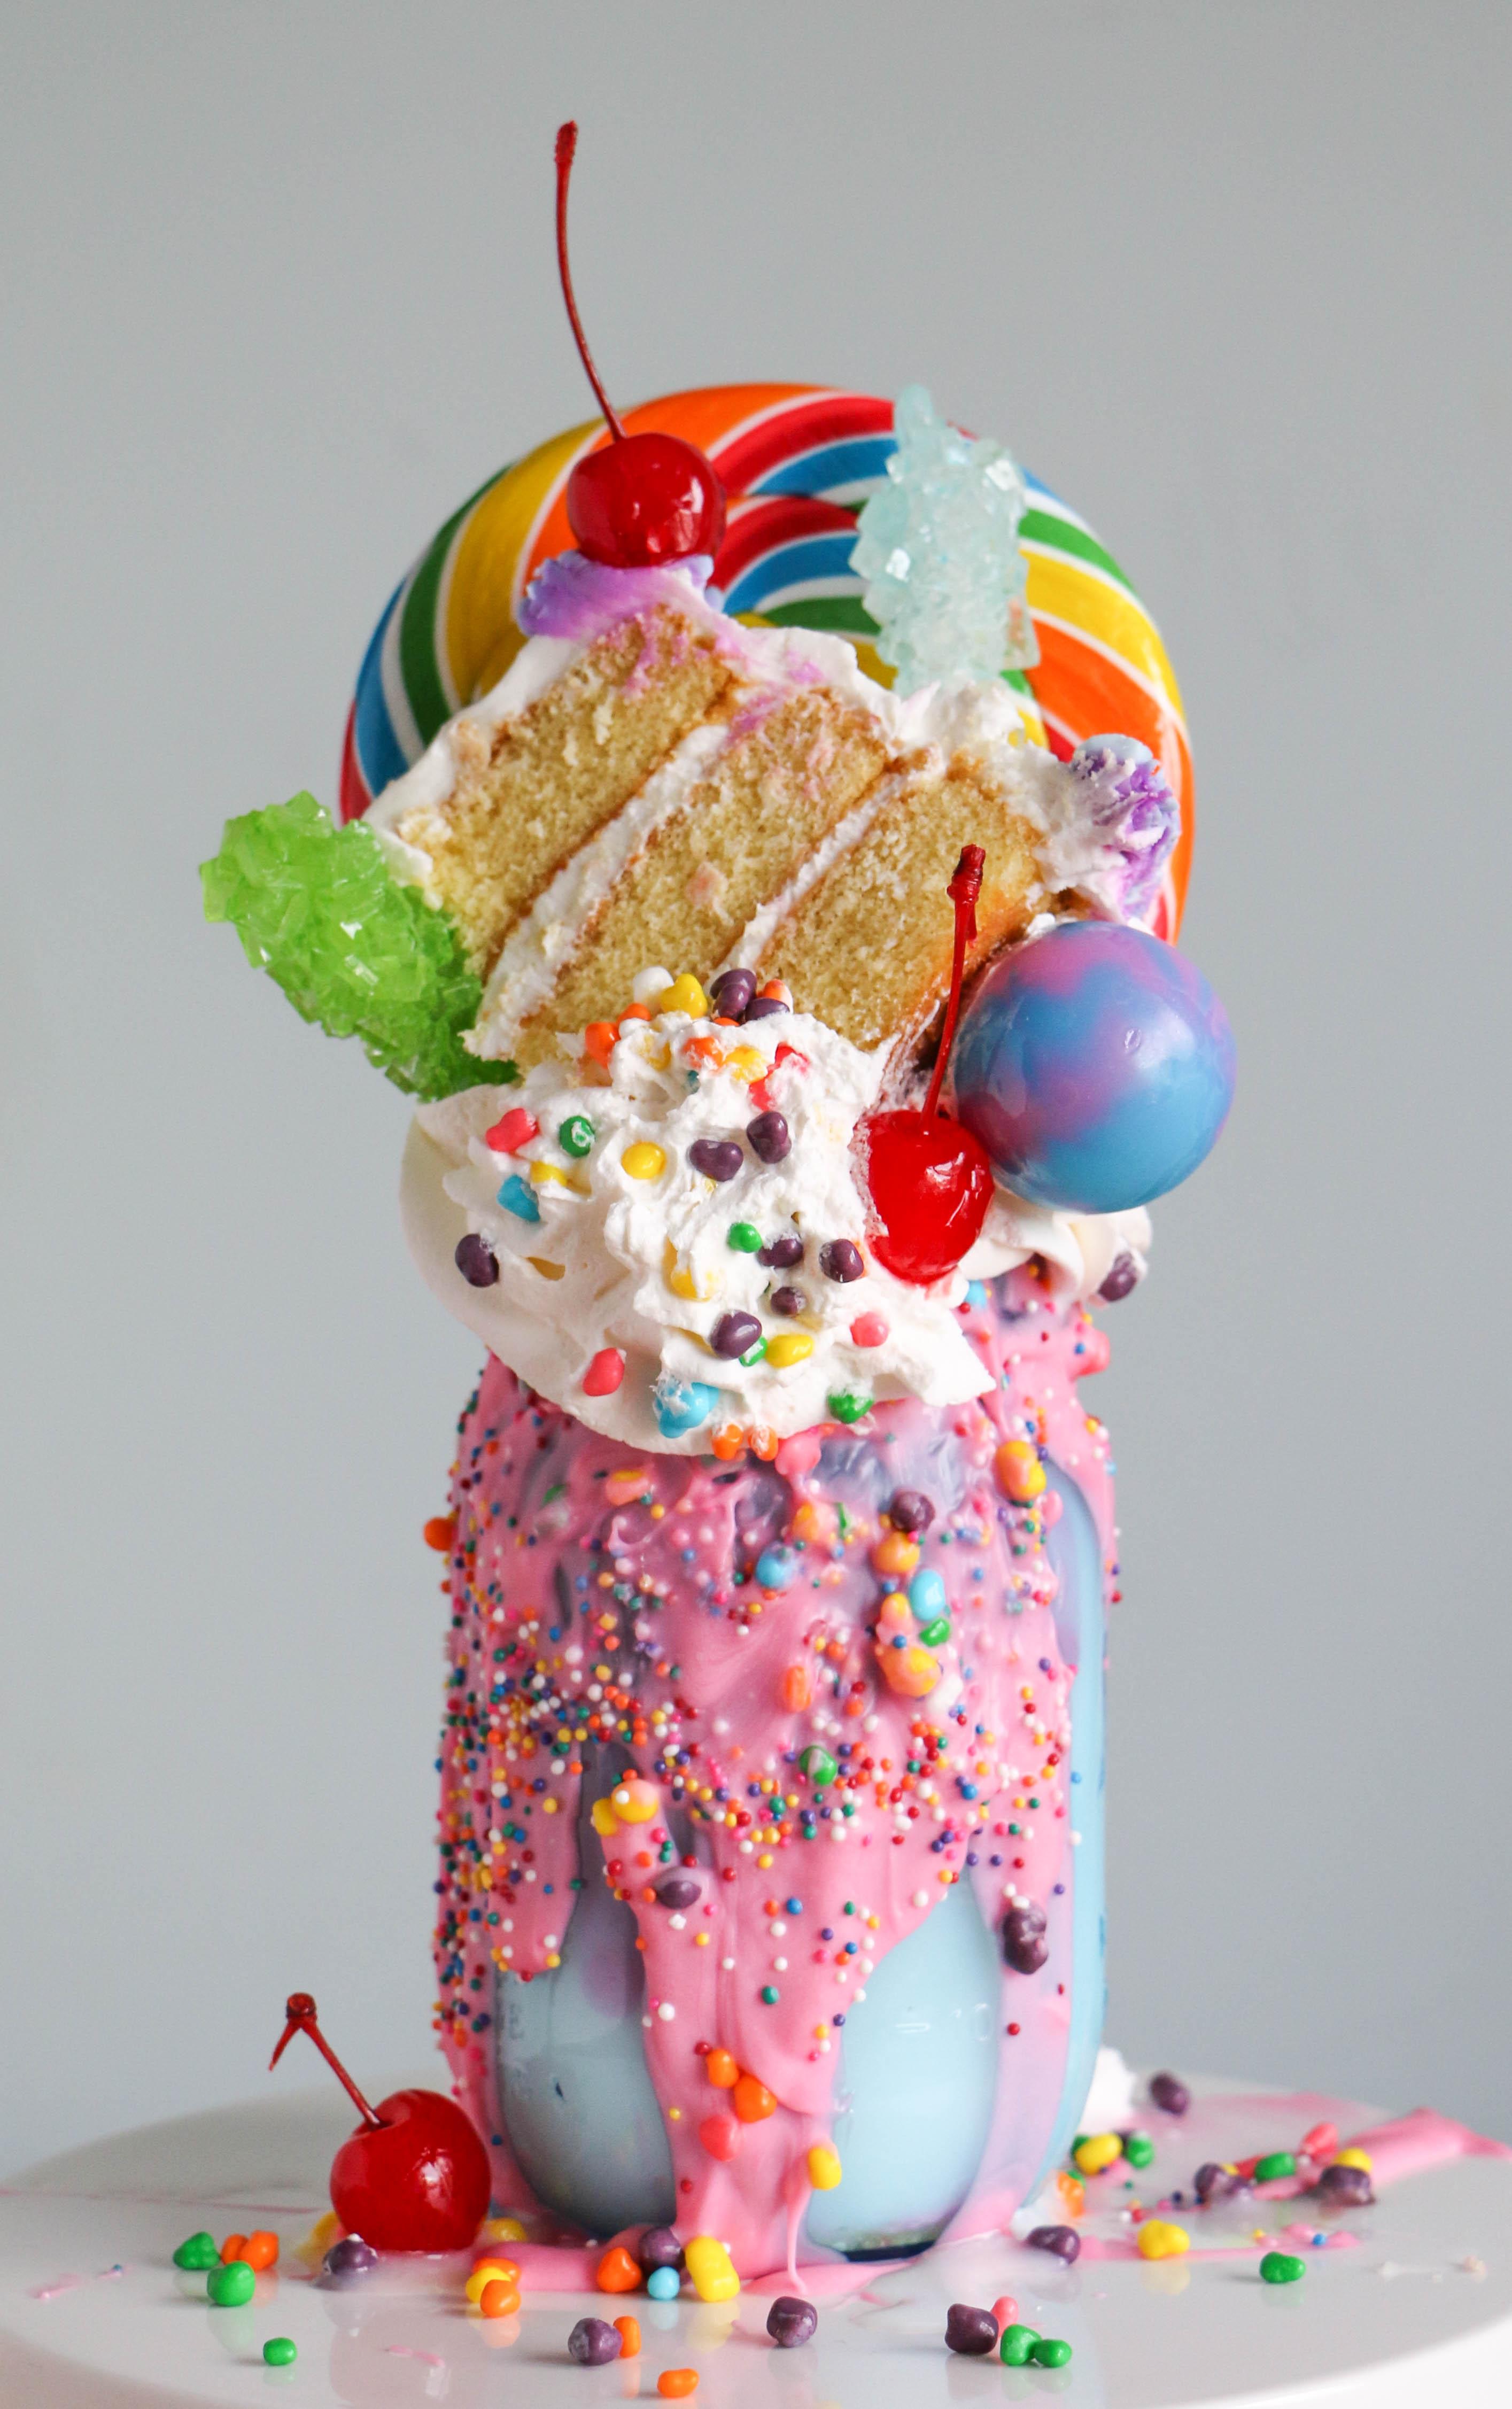 Fun Birthday Celebration Ideas for Kids